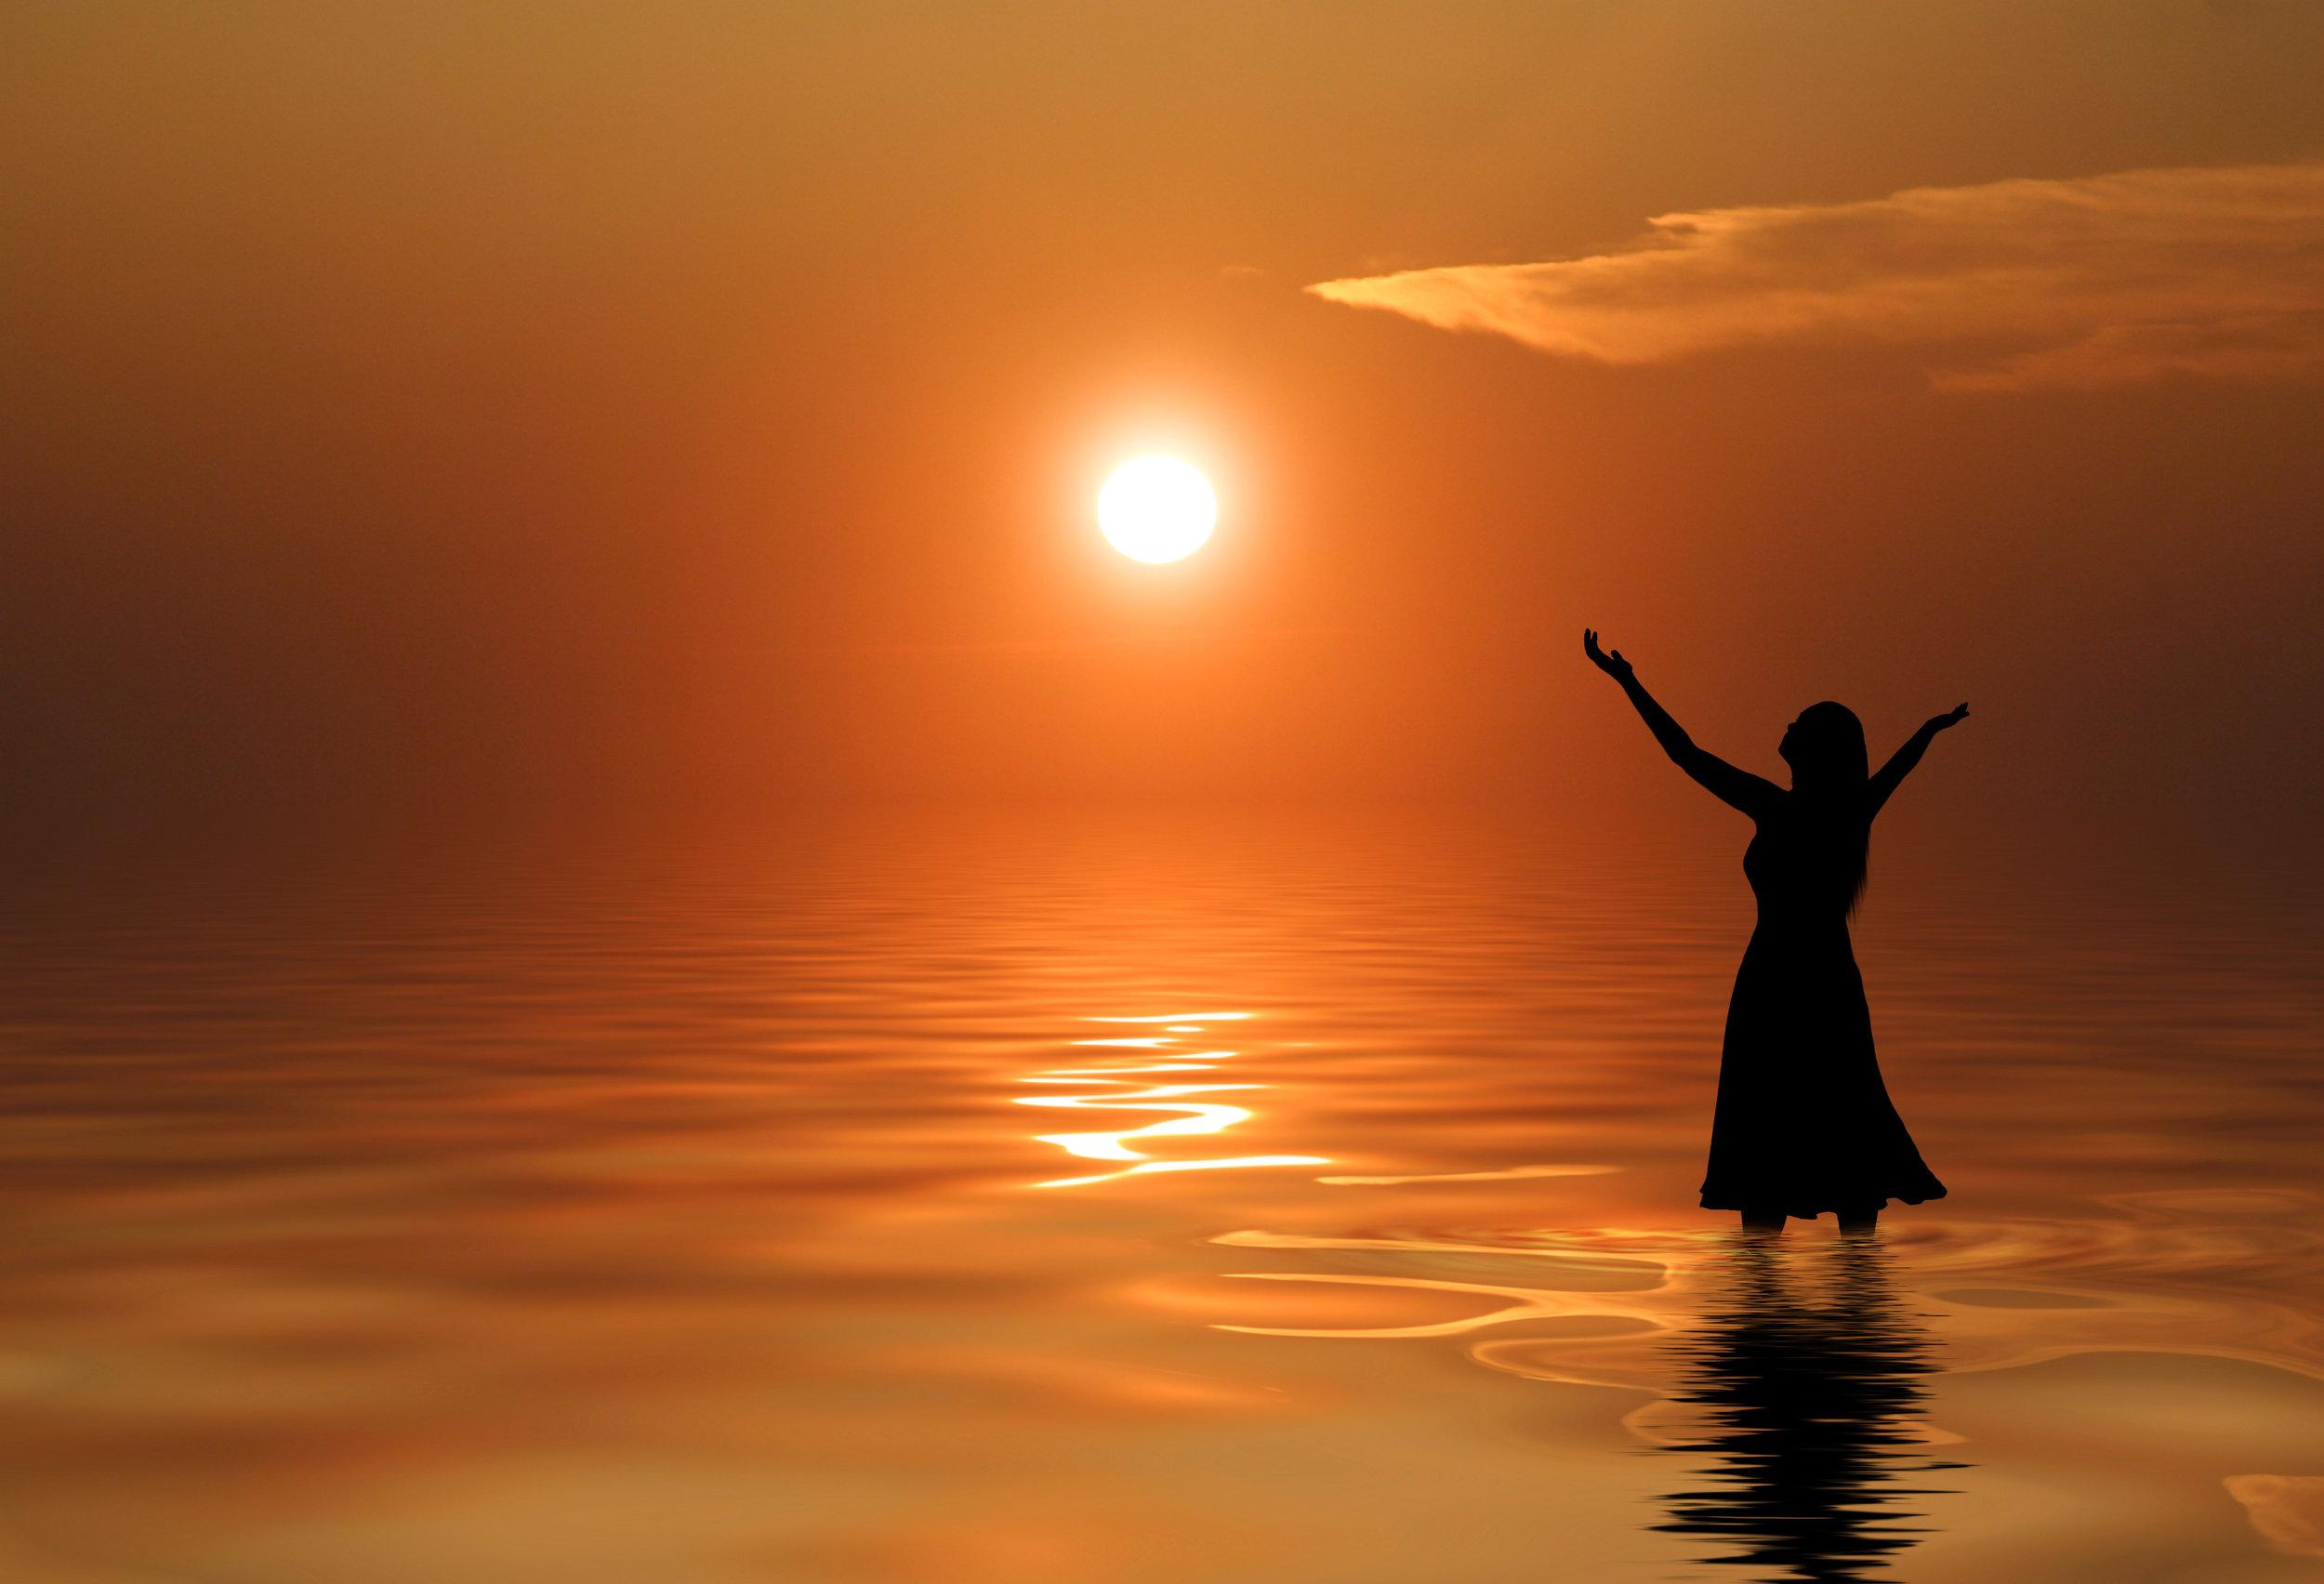 a-woman-in-a-dress-praises-at-sunset_rm85aCZgC.jpg